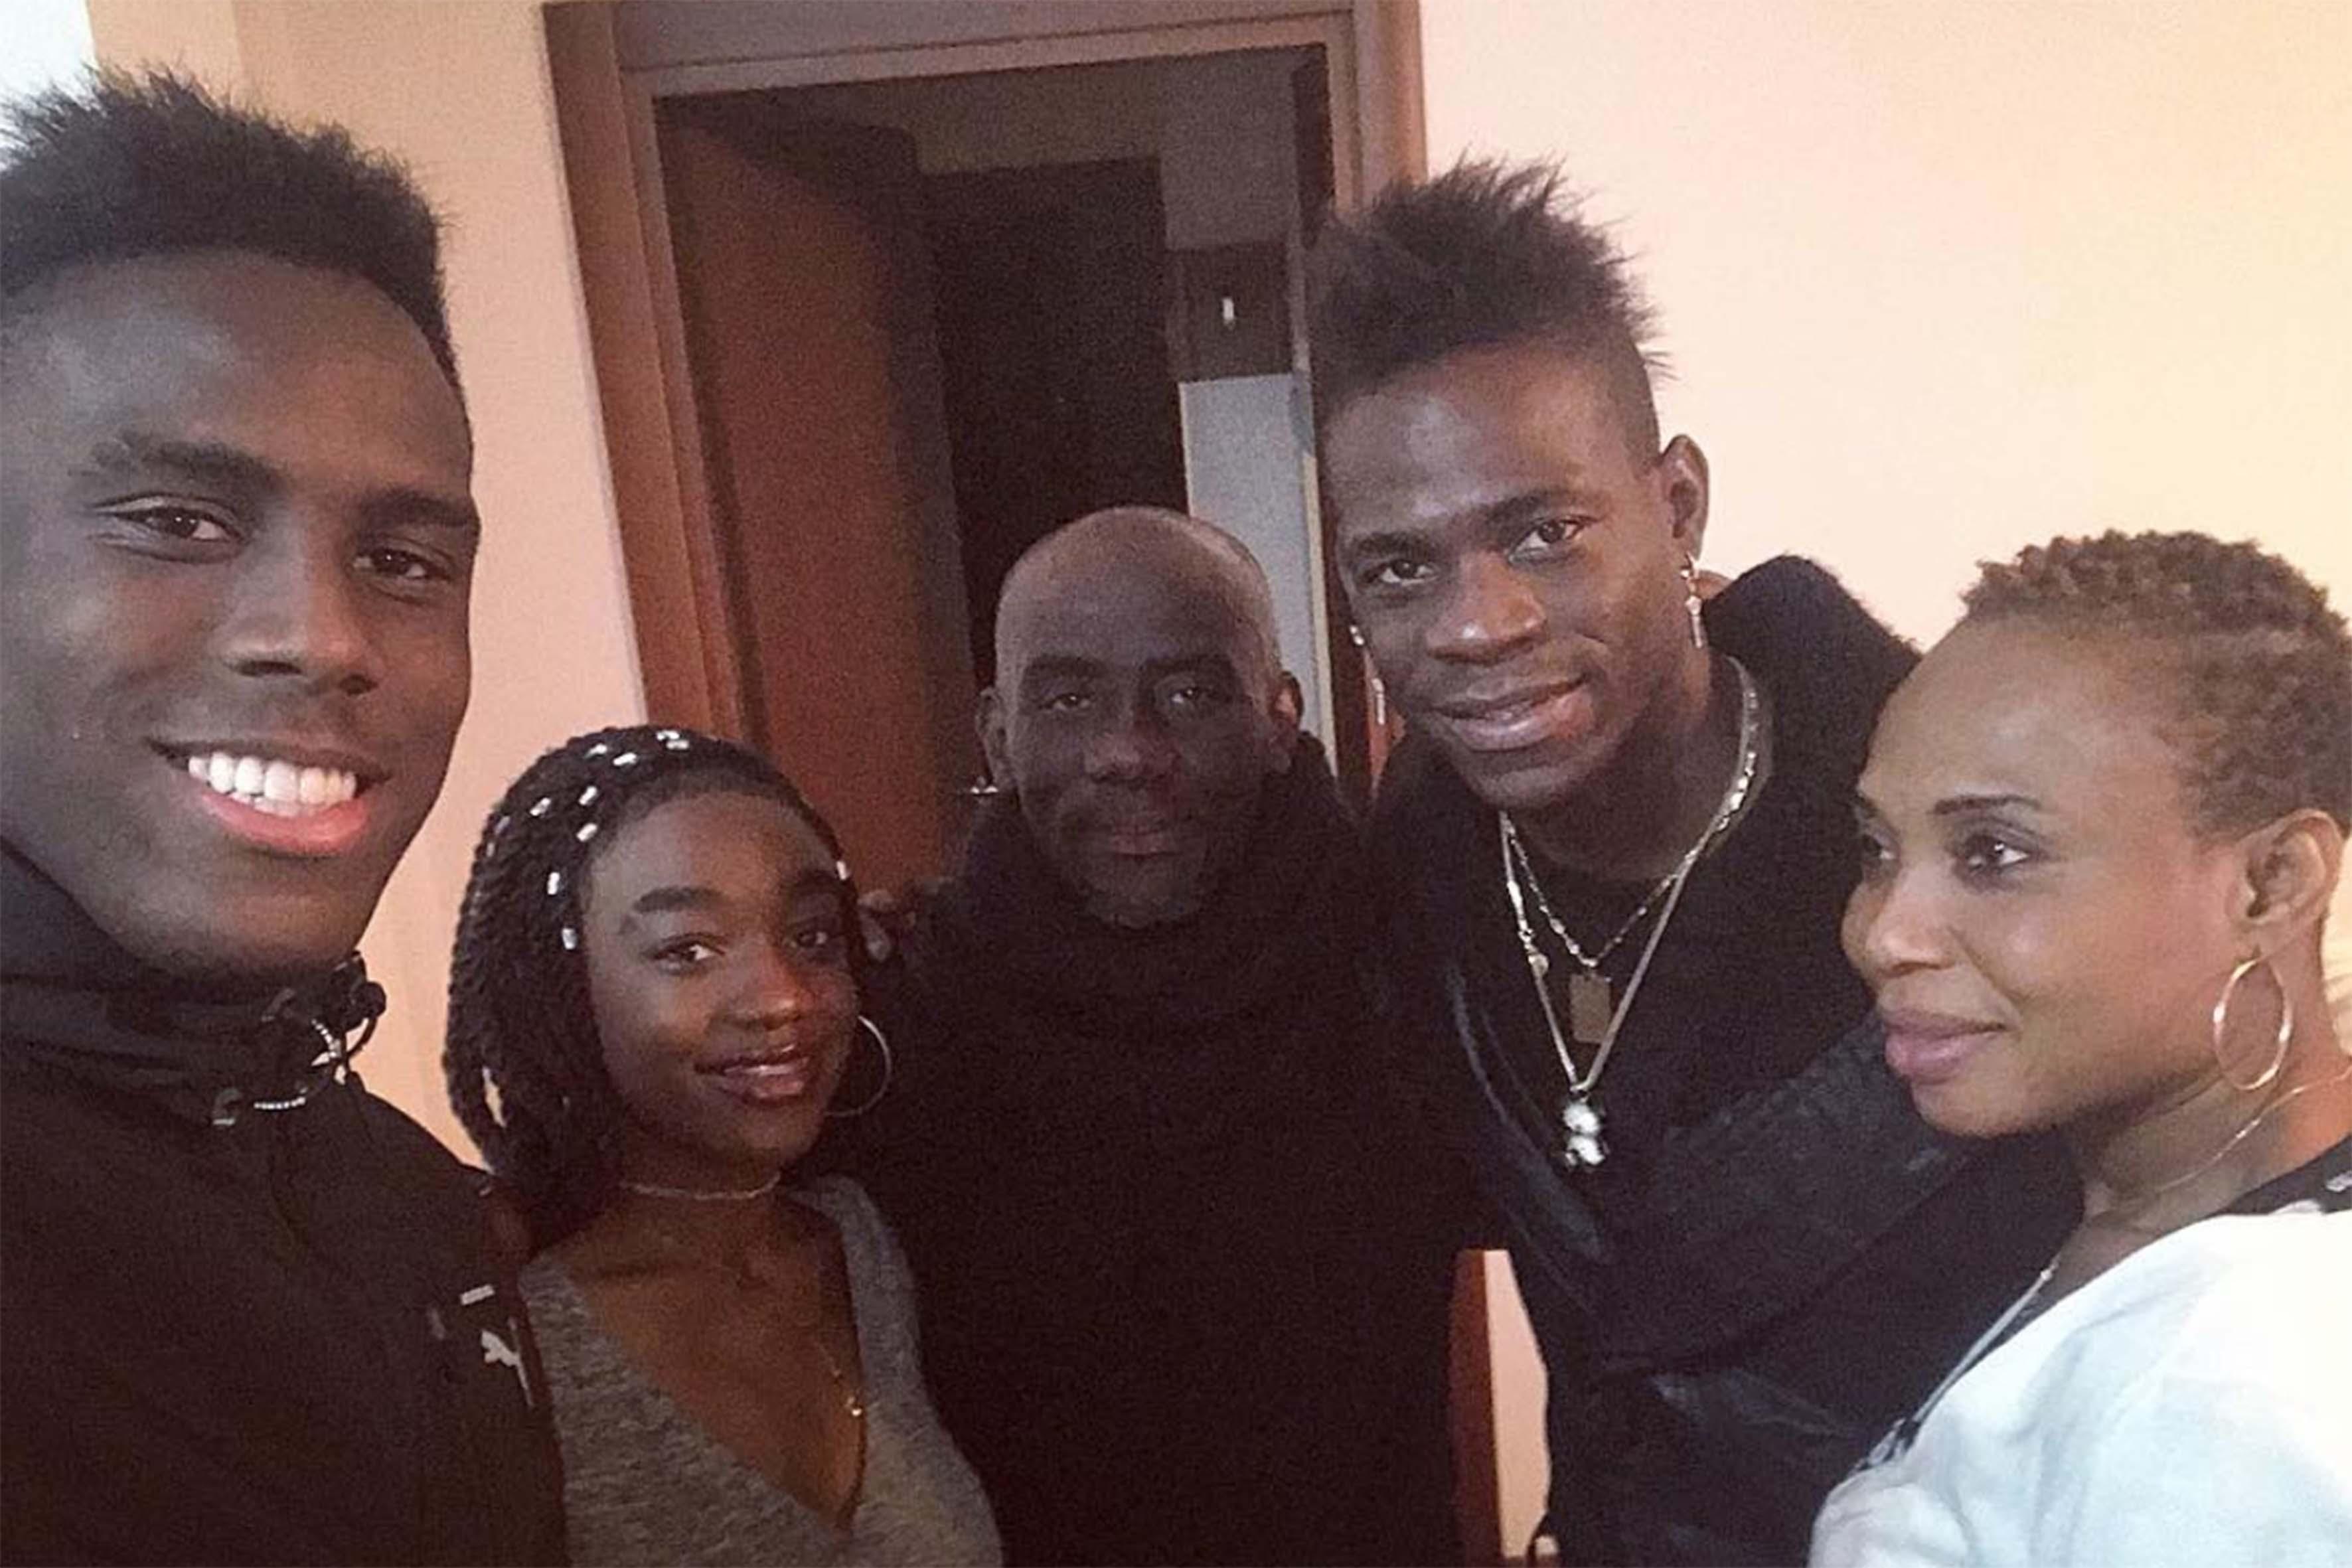 Da sinistra: Enock, Angel, Thomas Barwuah, Mario Balotelli e Rose Barwuah